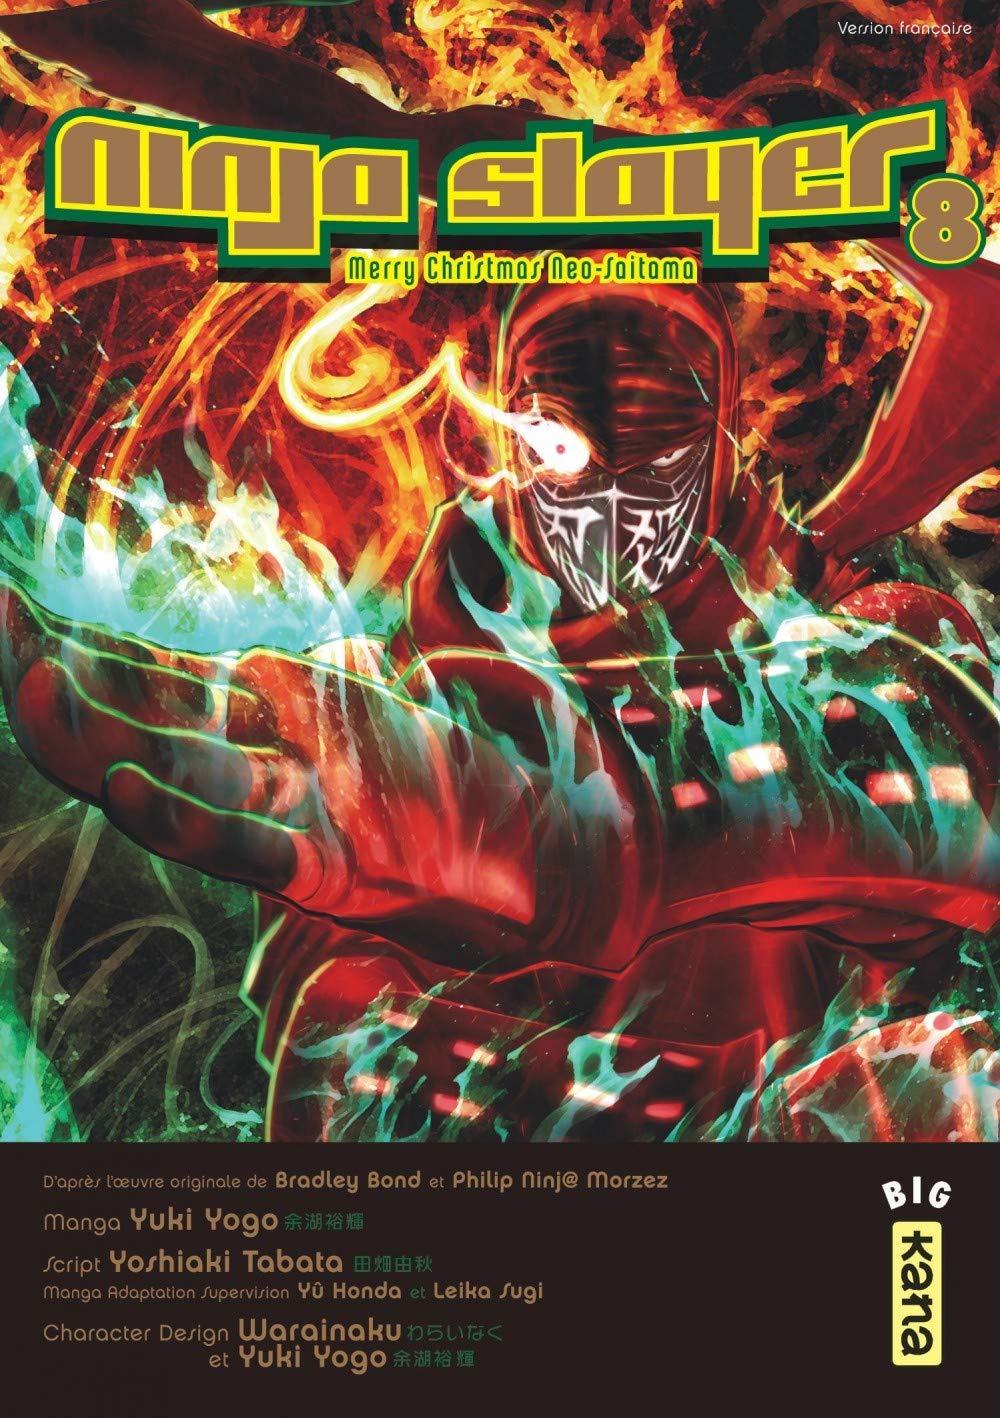 Ninja slayer, tome 8: Amazon.es: Yoshiaki Tabata, Yuki Yogo ...